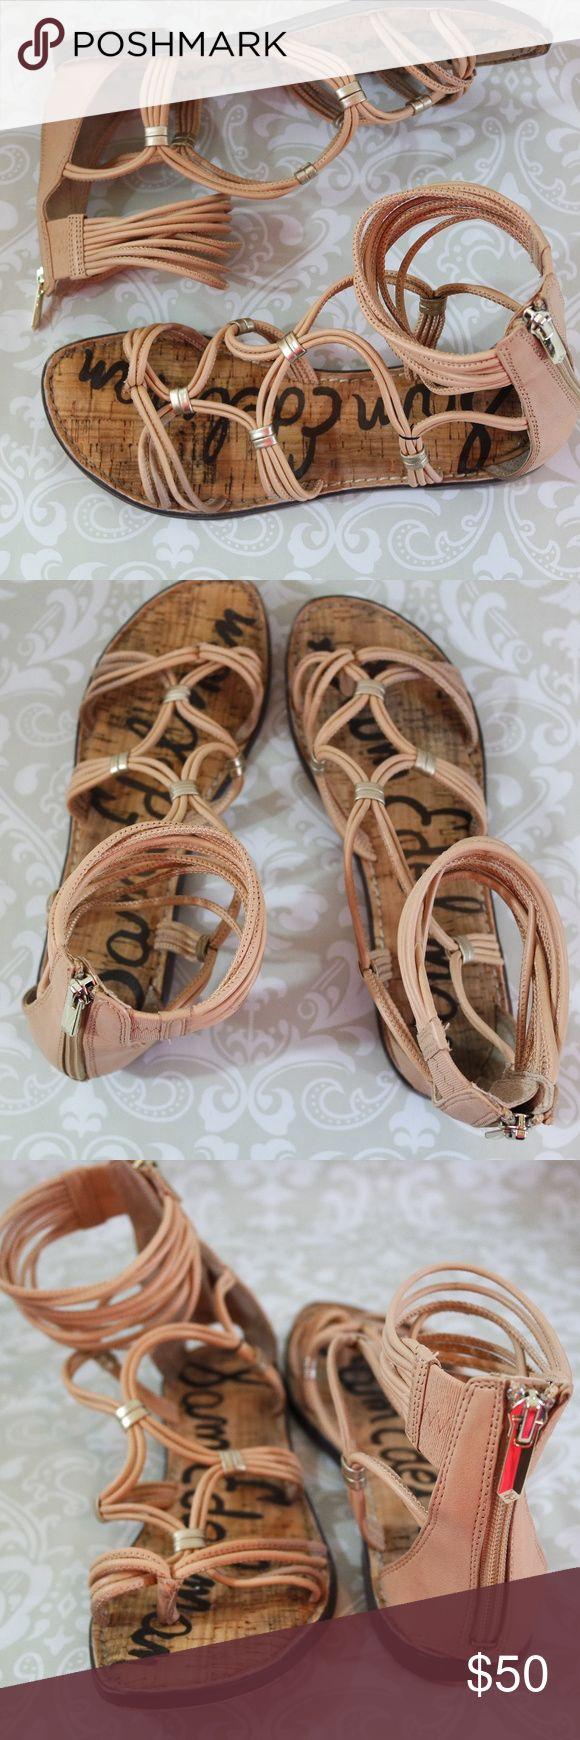 Sam Edelman Gladiator Sandals Size 8M Excellent pre-loved condition tan gladiator sandals.  Size 8M.  Cork and leather. Sam Edelman Shoes Sandals